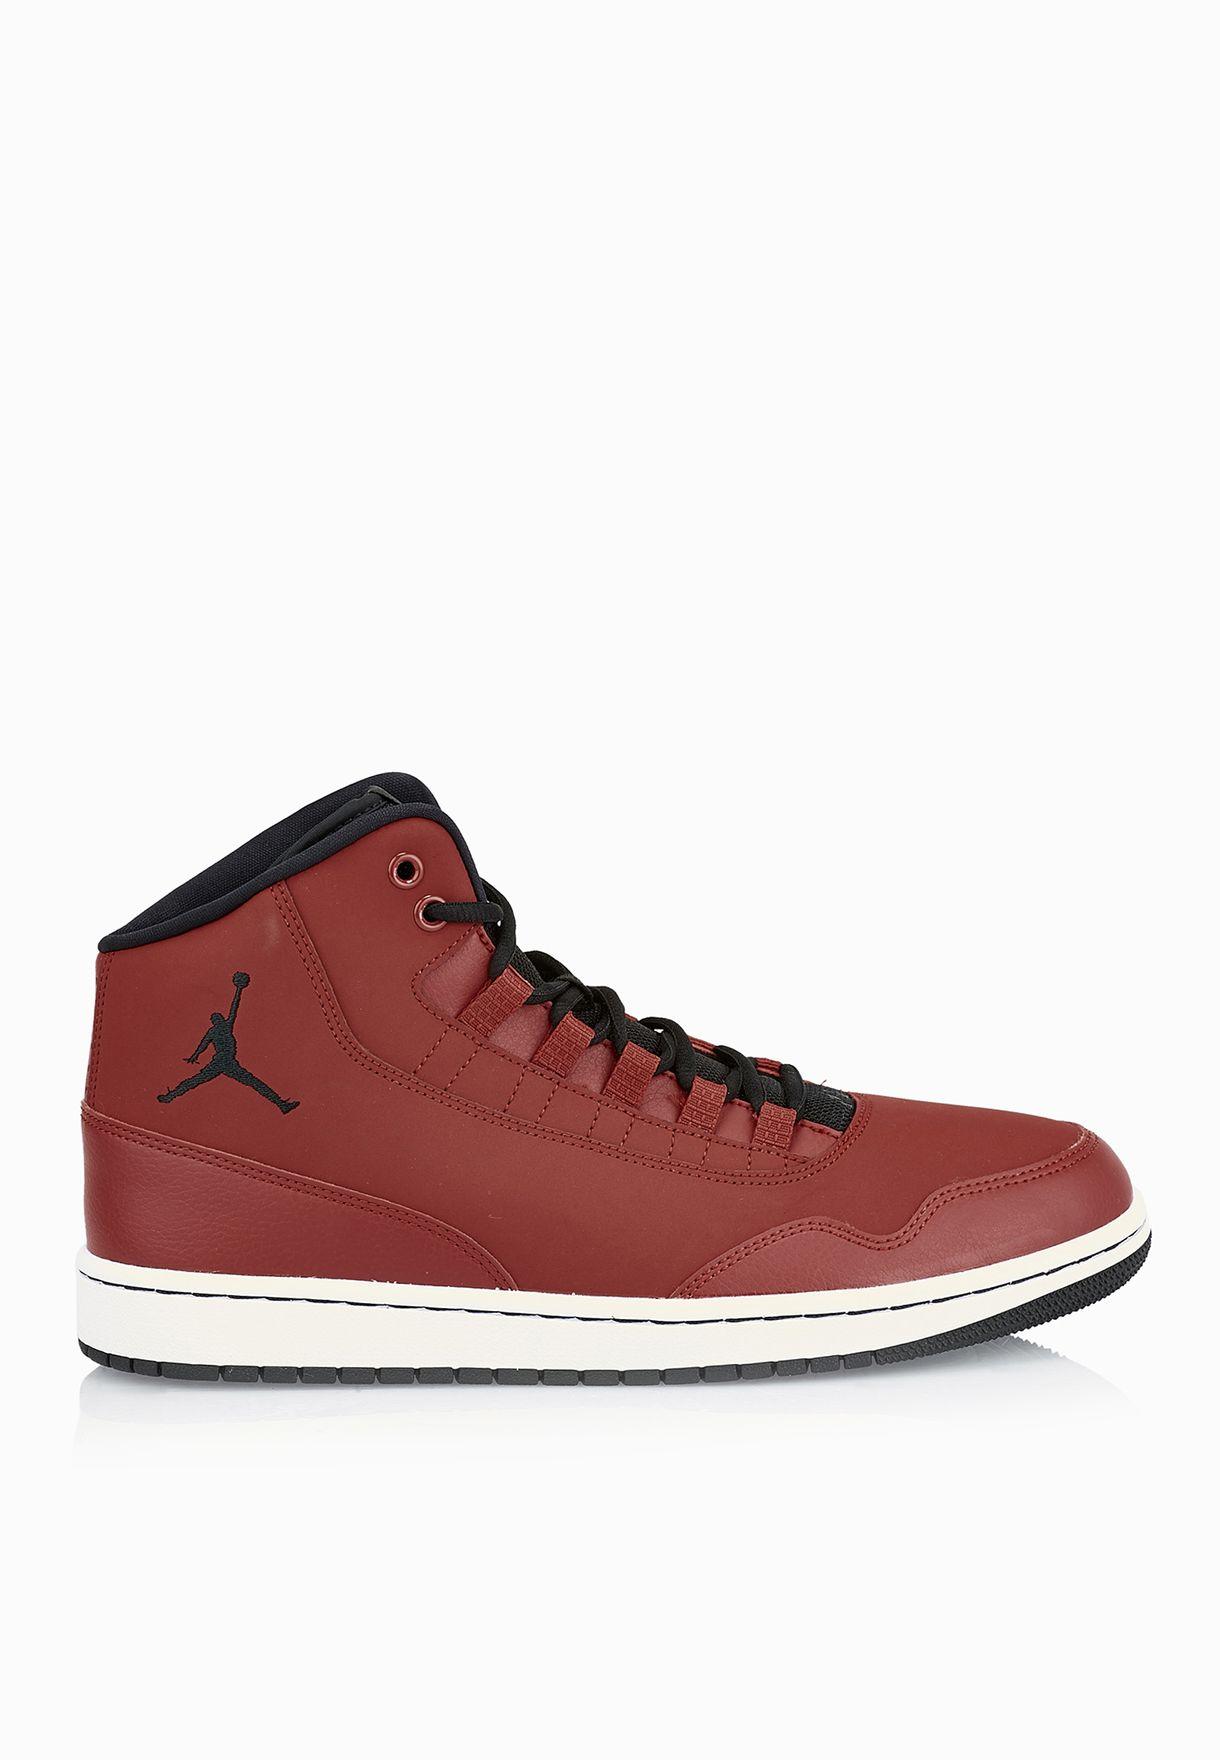 quality design 2b30b e8fc7 Jordan Executive